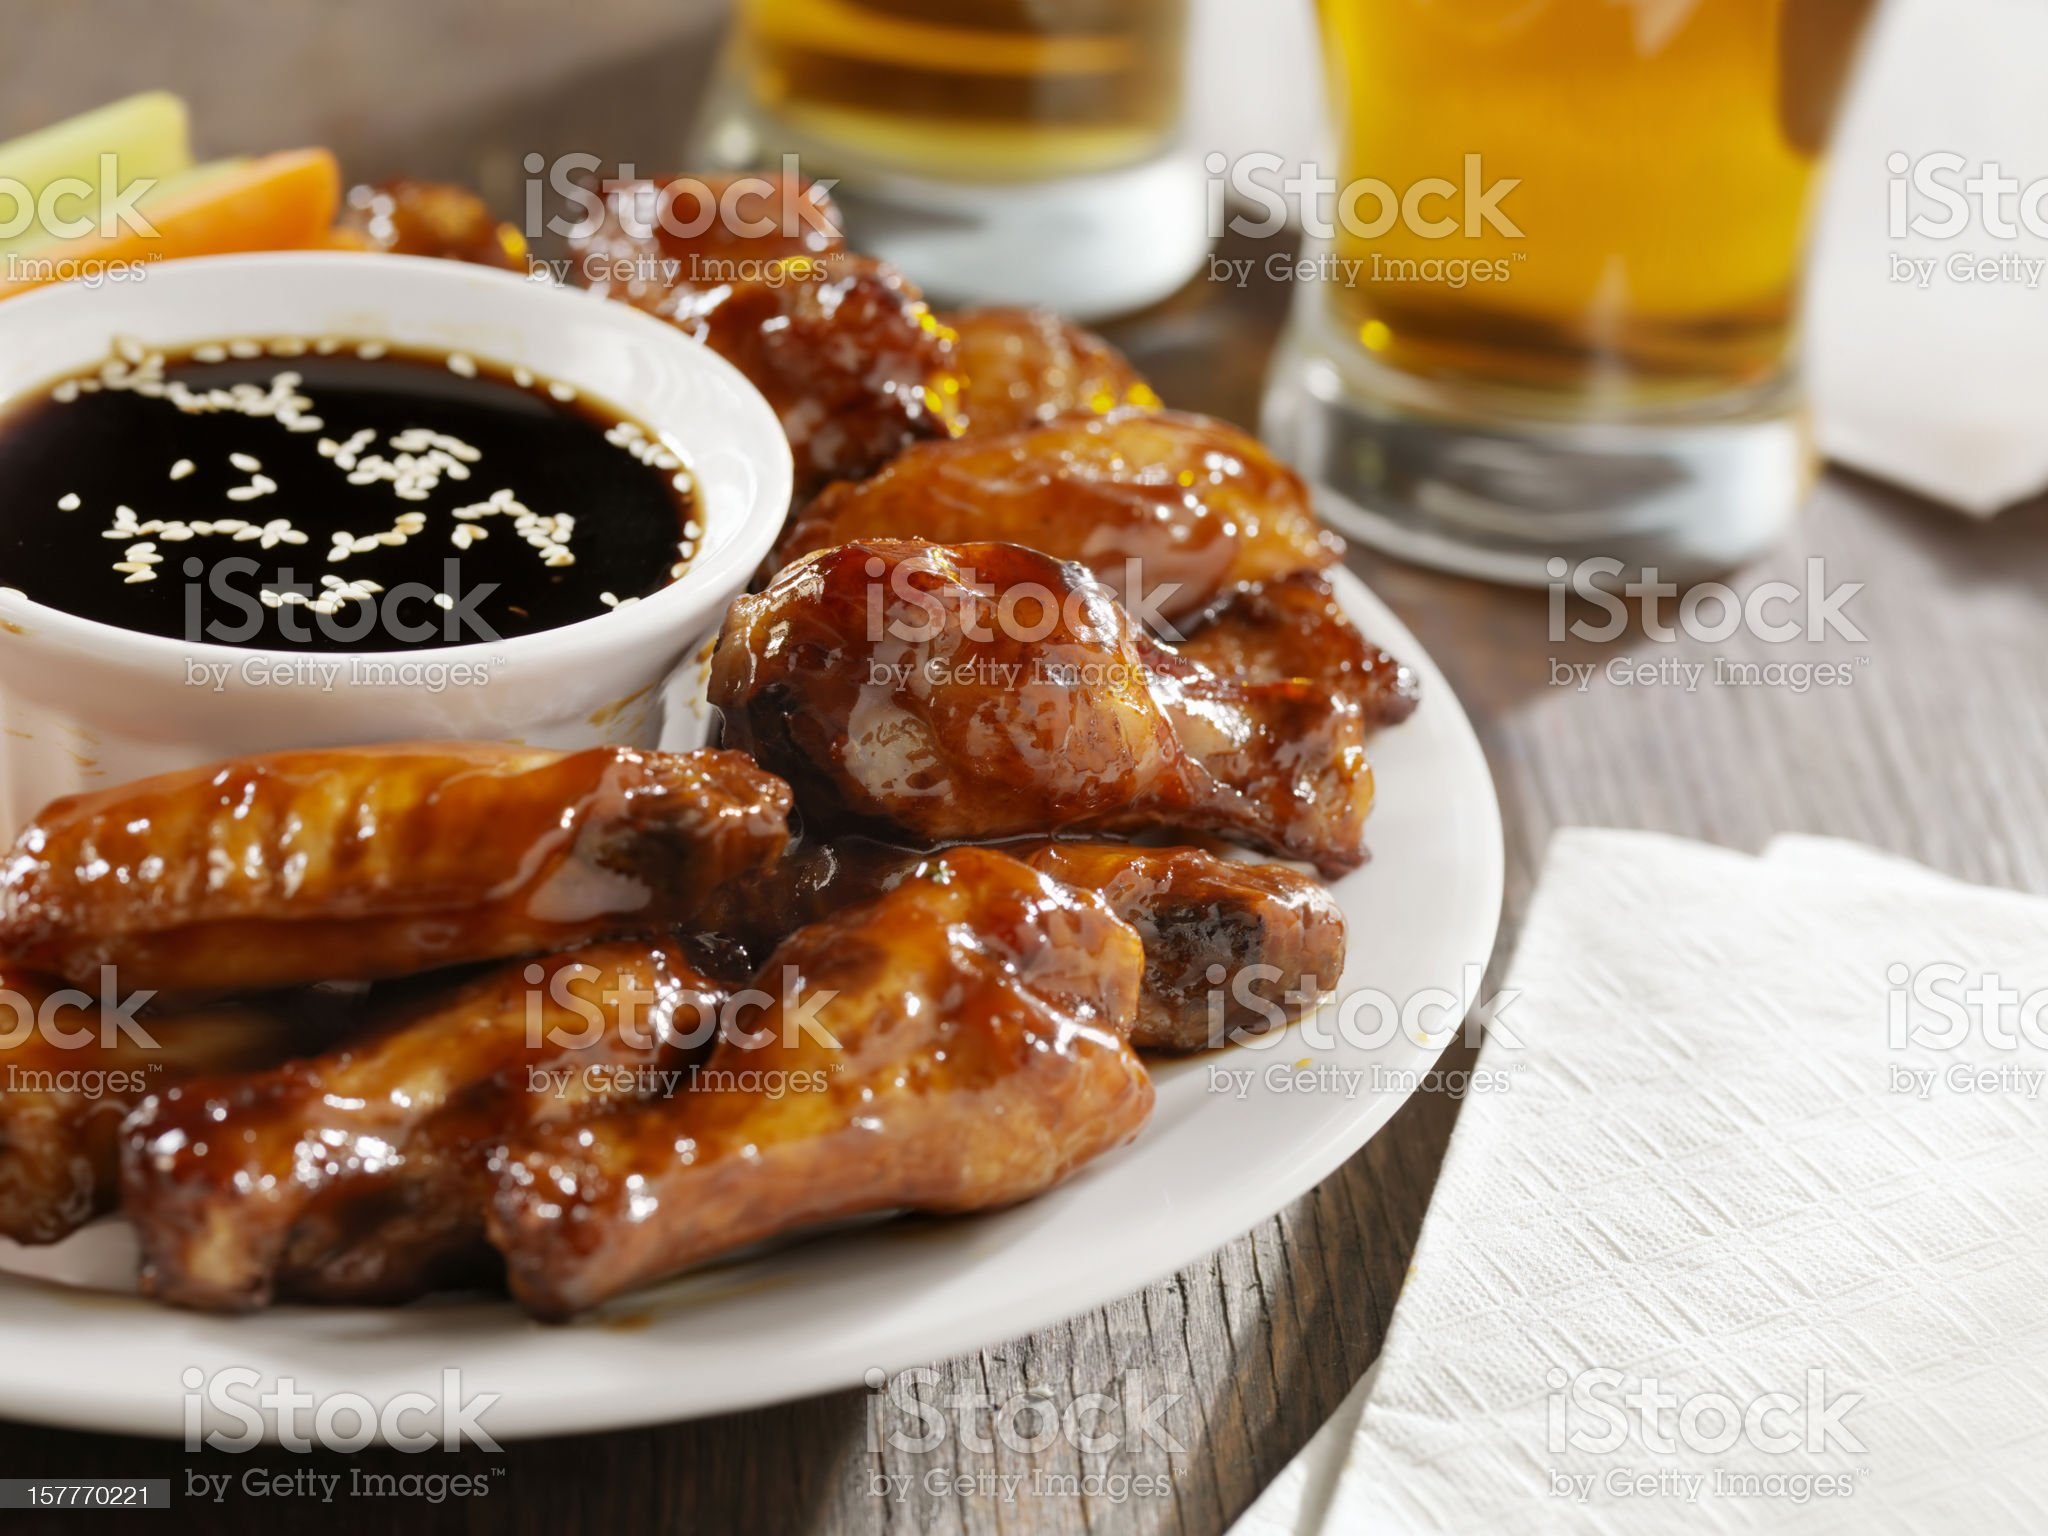 Teriyaki Chicken Wings and Beer royalty-free stock photo